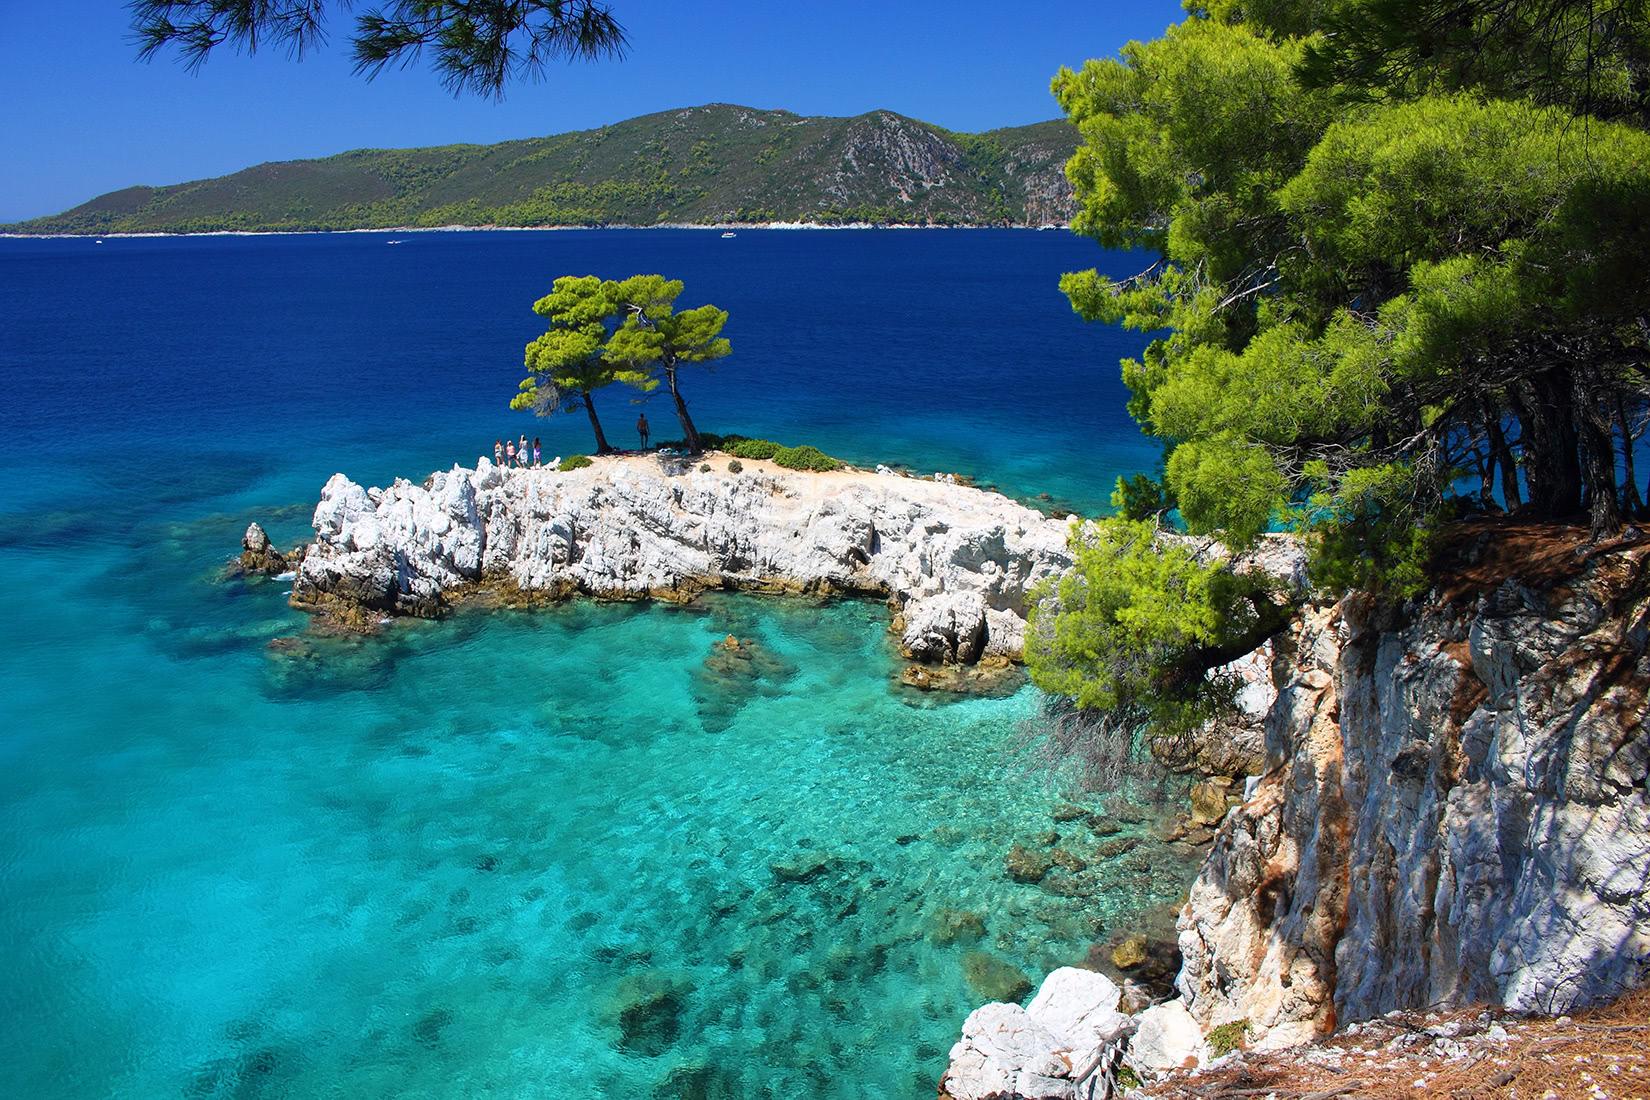 real estate investing greece greek islands dream estates advisor luxe digital